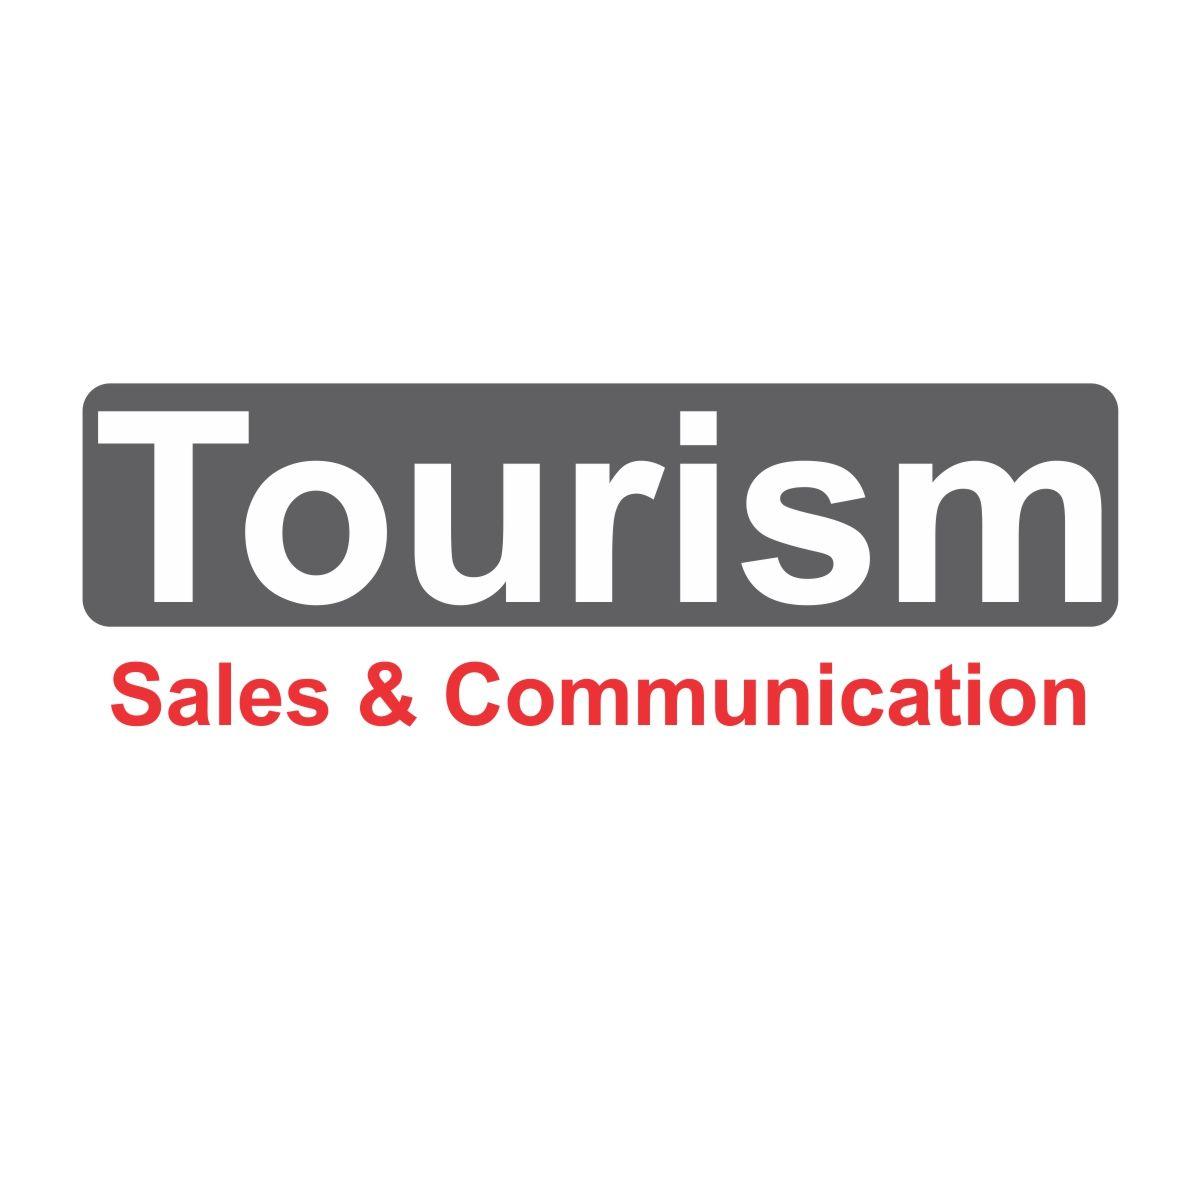 Romania Tourism and Communication